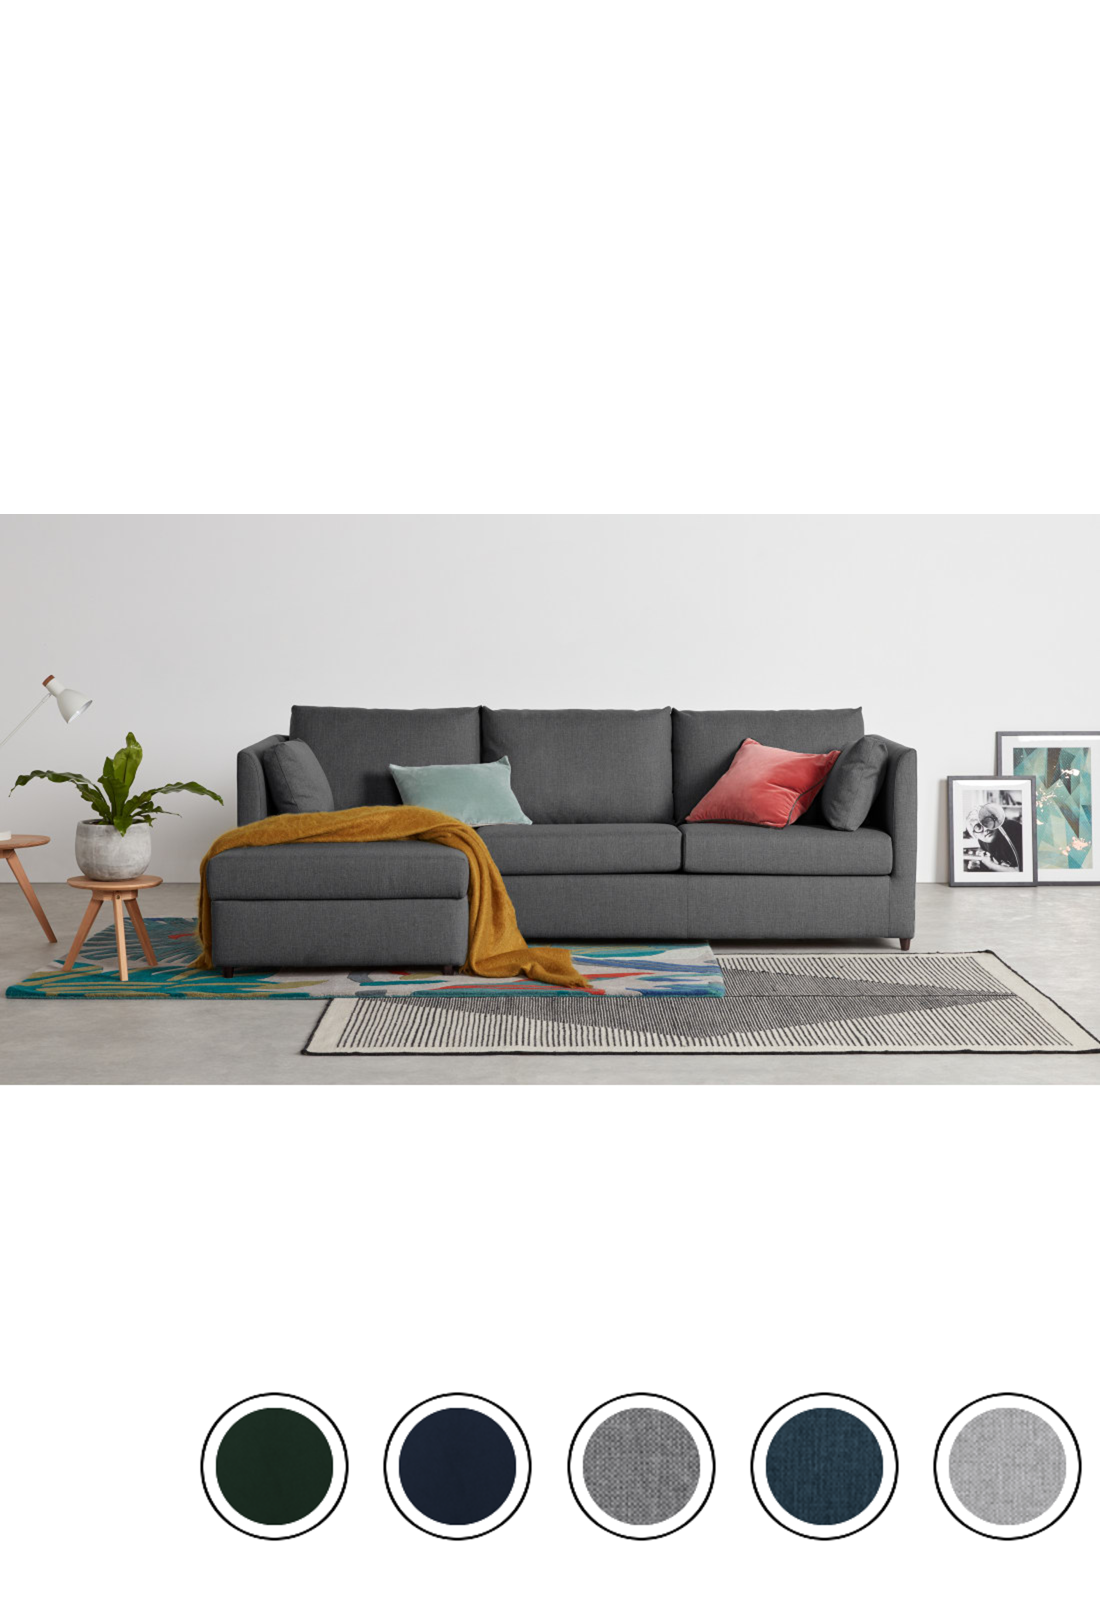 Milner Left Hand Facing Corner Storage Sofa Bed With Foam Mattress